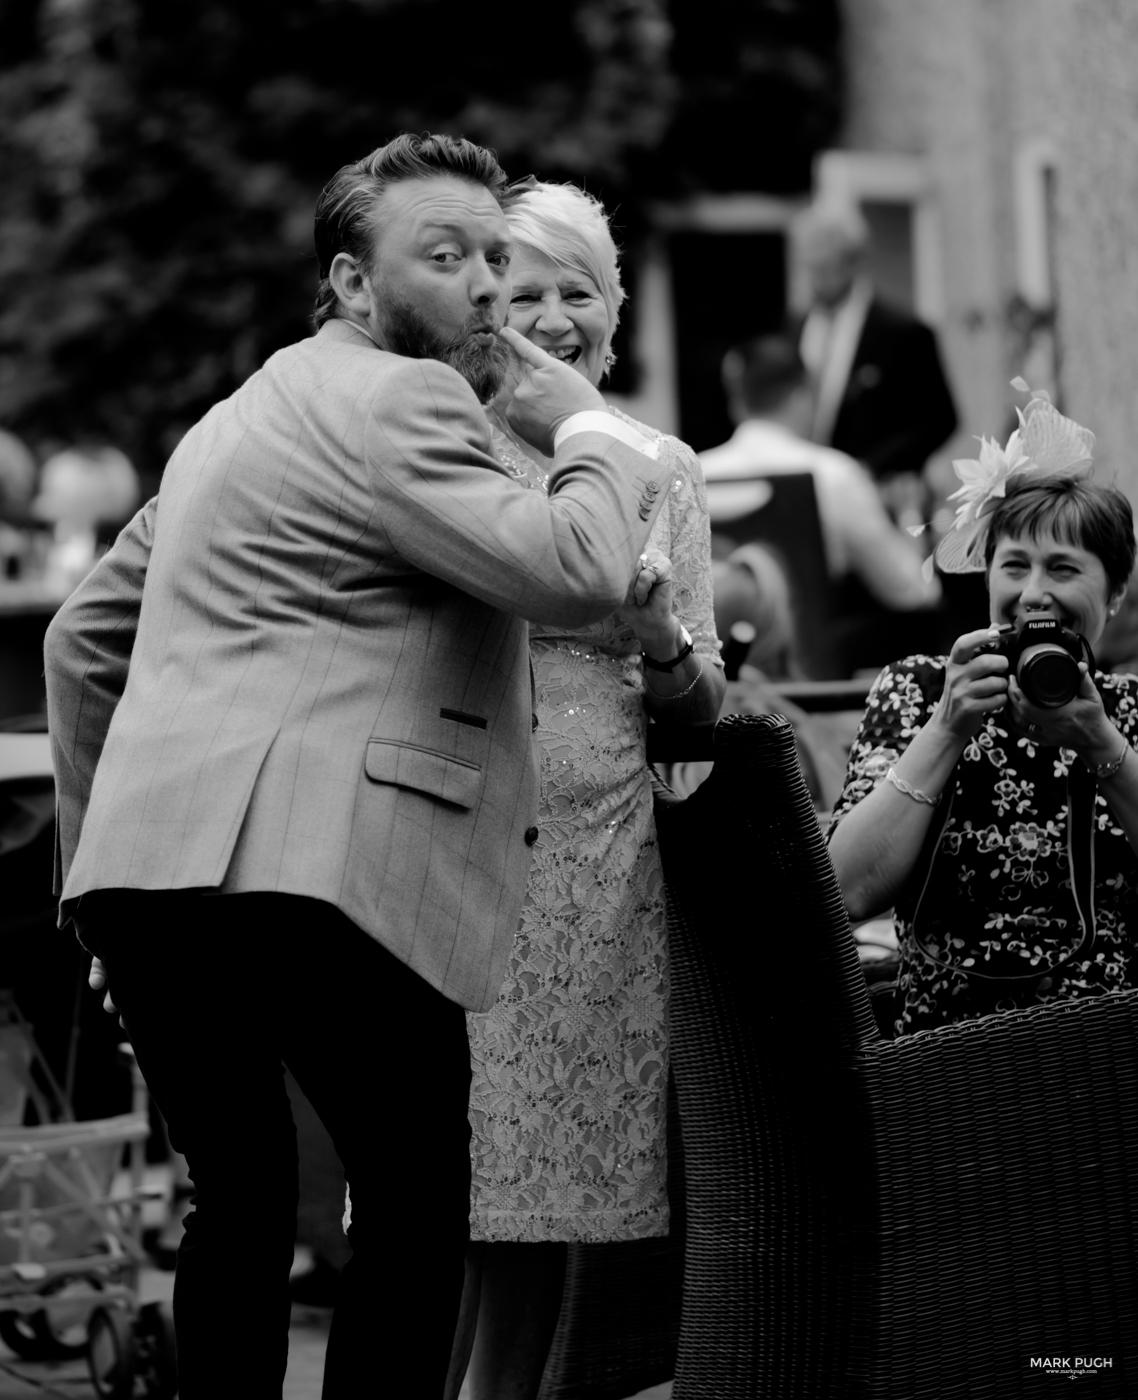 243 Wedding Photography Award winning Wedding Photographer and Videographer Mark Pugh www.markpugh.com.JPG